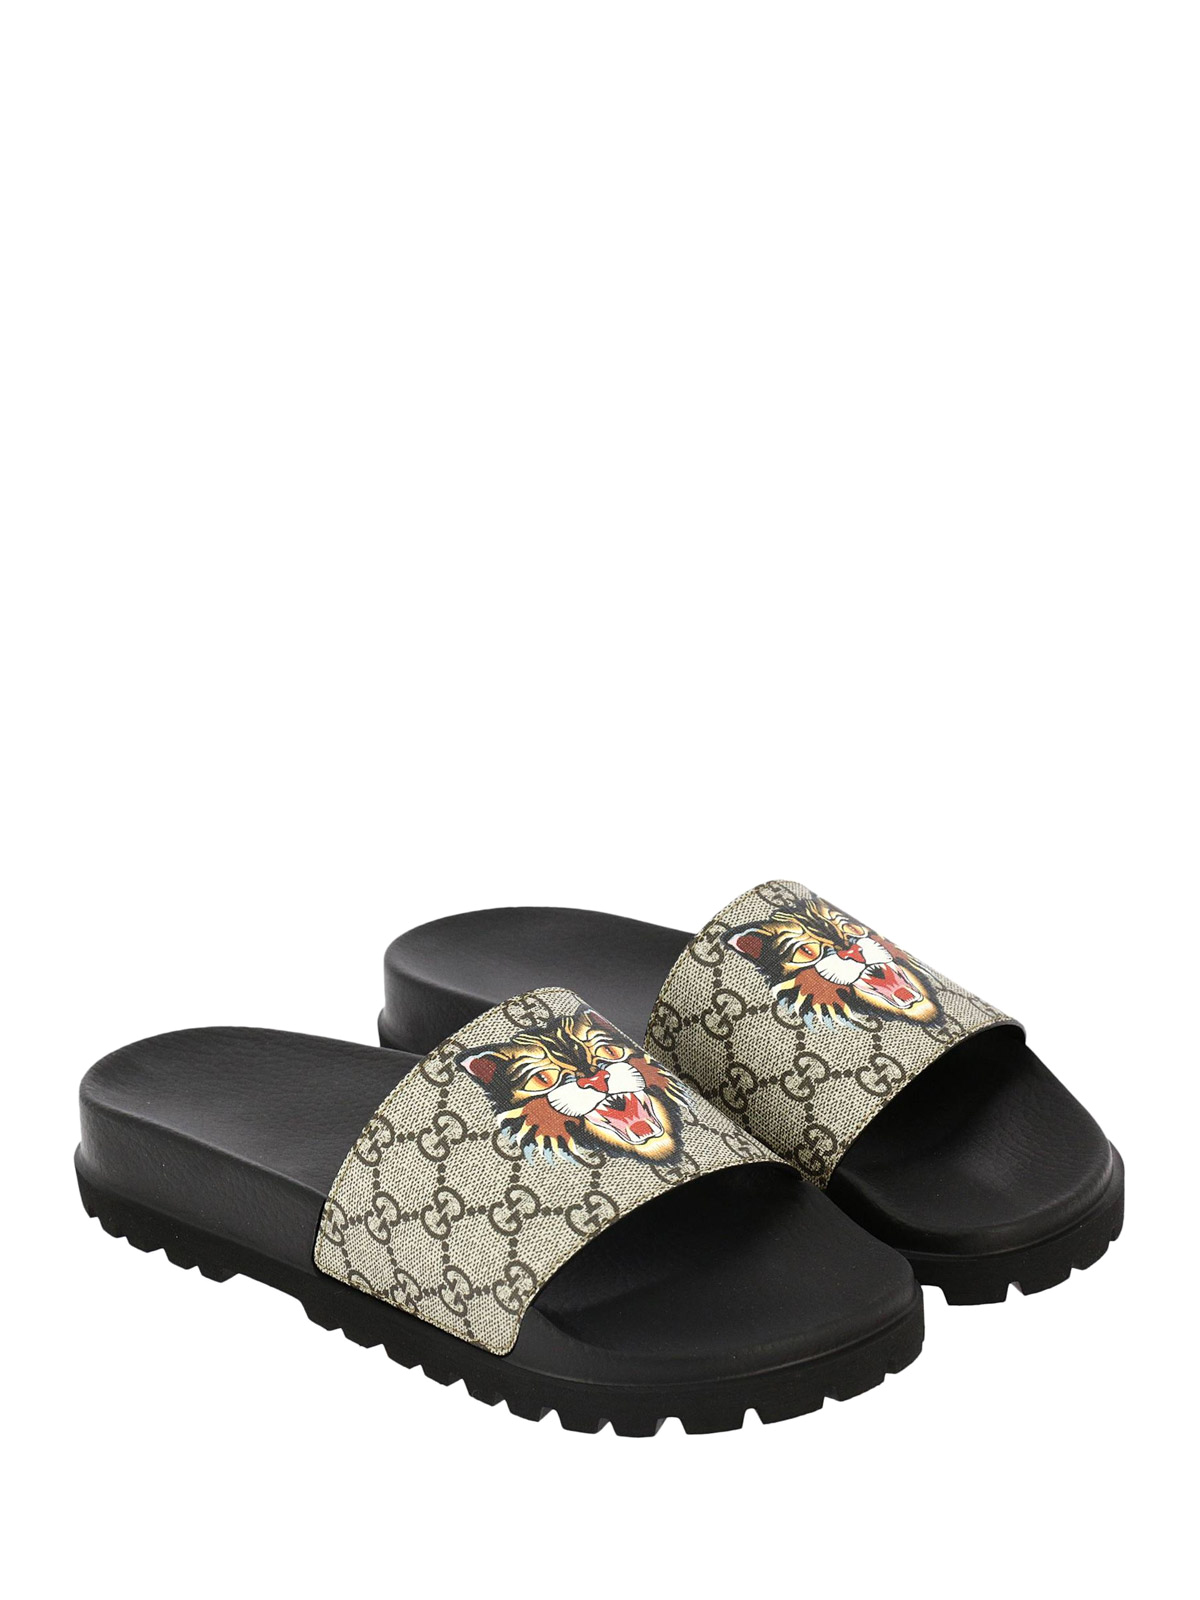 fff6a8d6d11 Gucci - Angry Cat GG supreme slides - sandals - 474282 9A400 8919